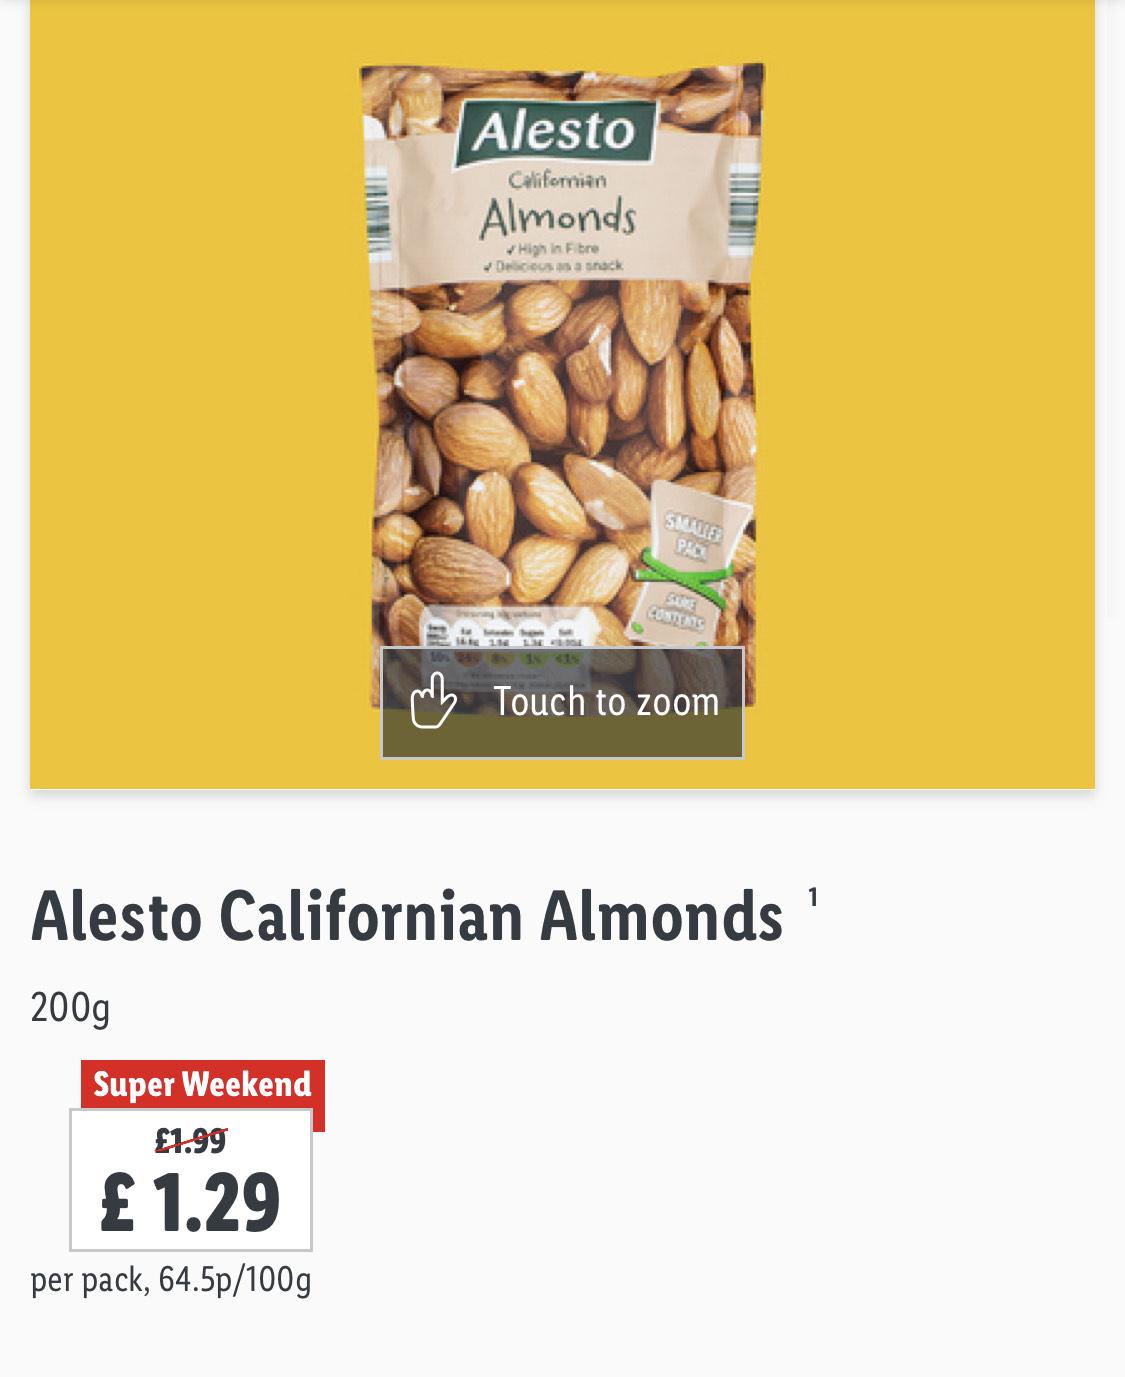 Alesto Californian Almonds 200g - £1.29 @ LIDL